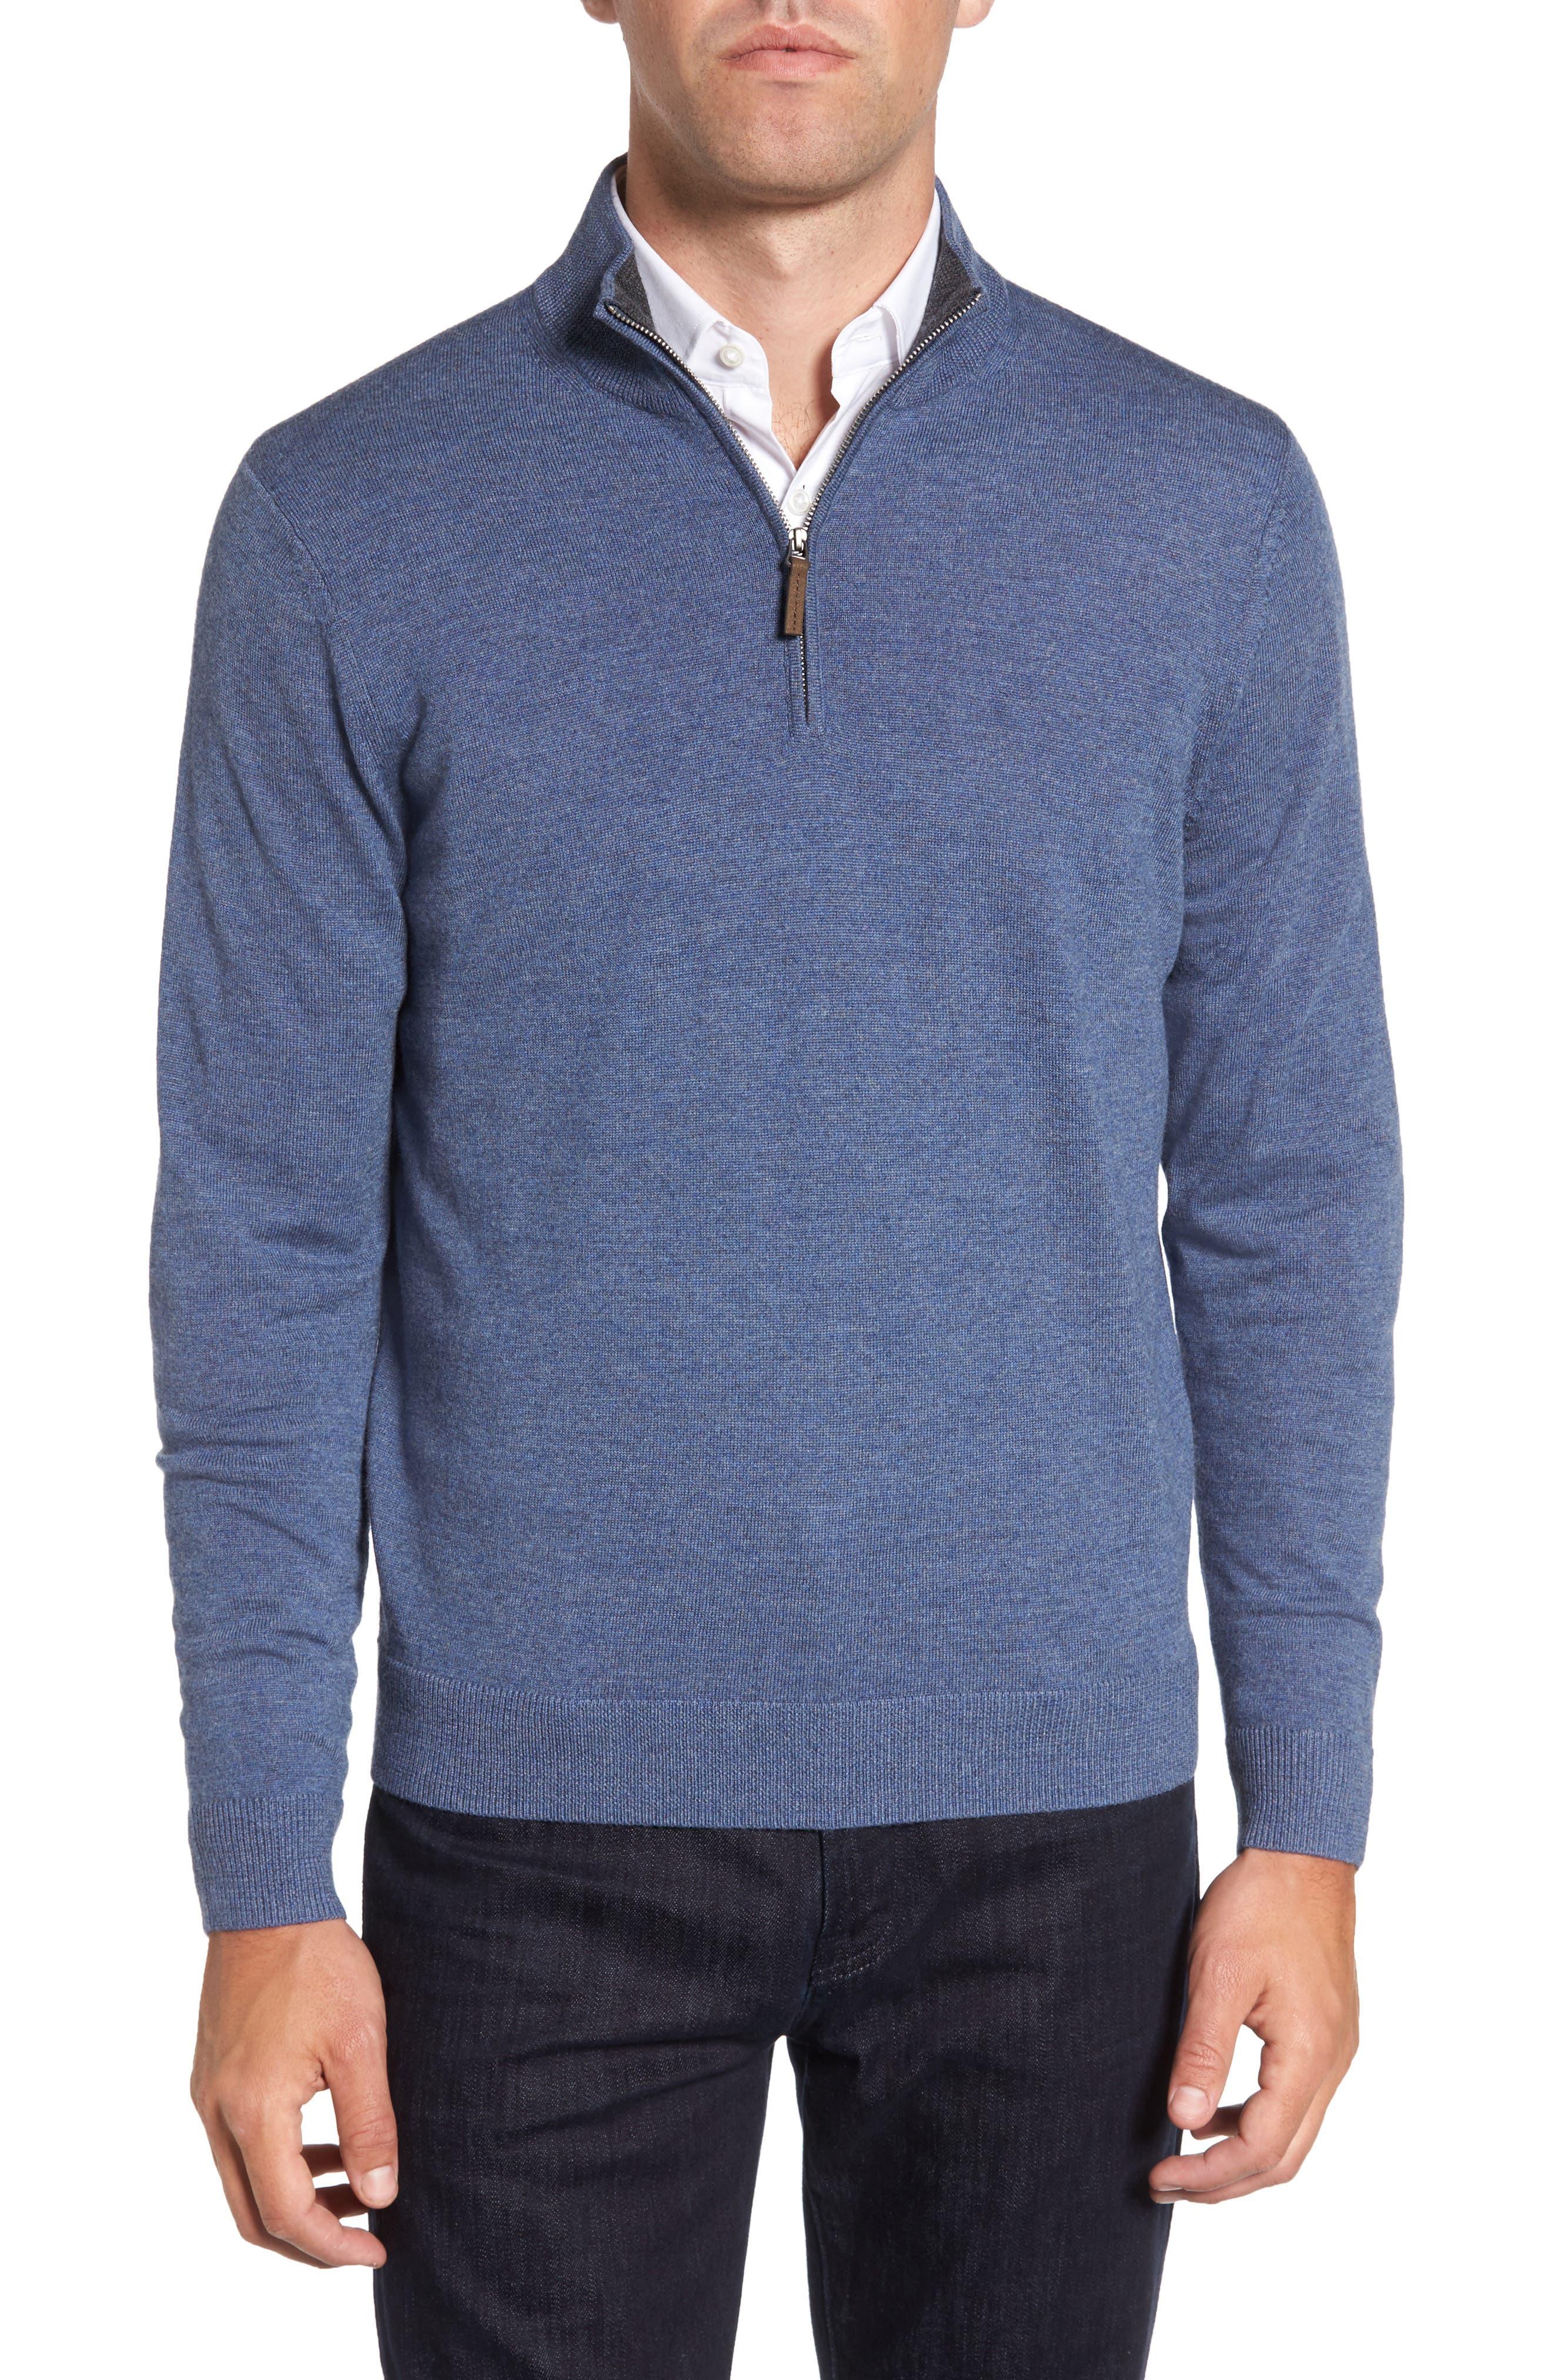 Alternate Image 1 Selected - Nordstrom Men's Shop Quarter Zip Merino Wool Pullover